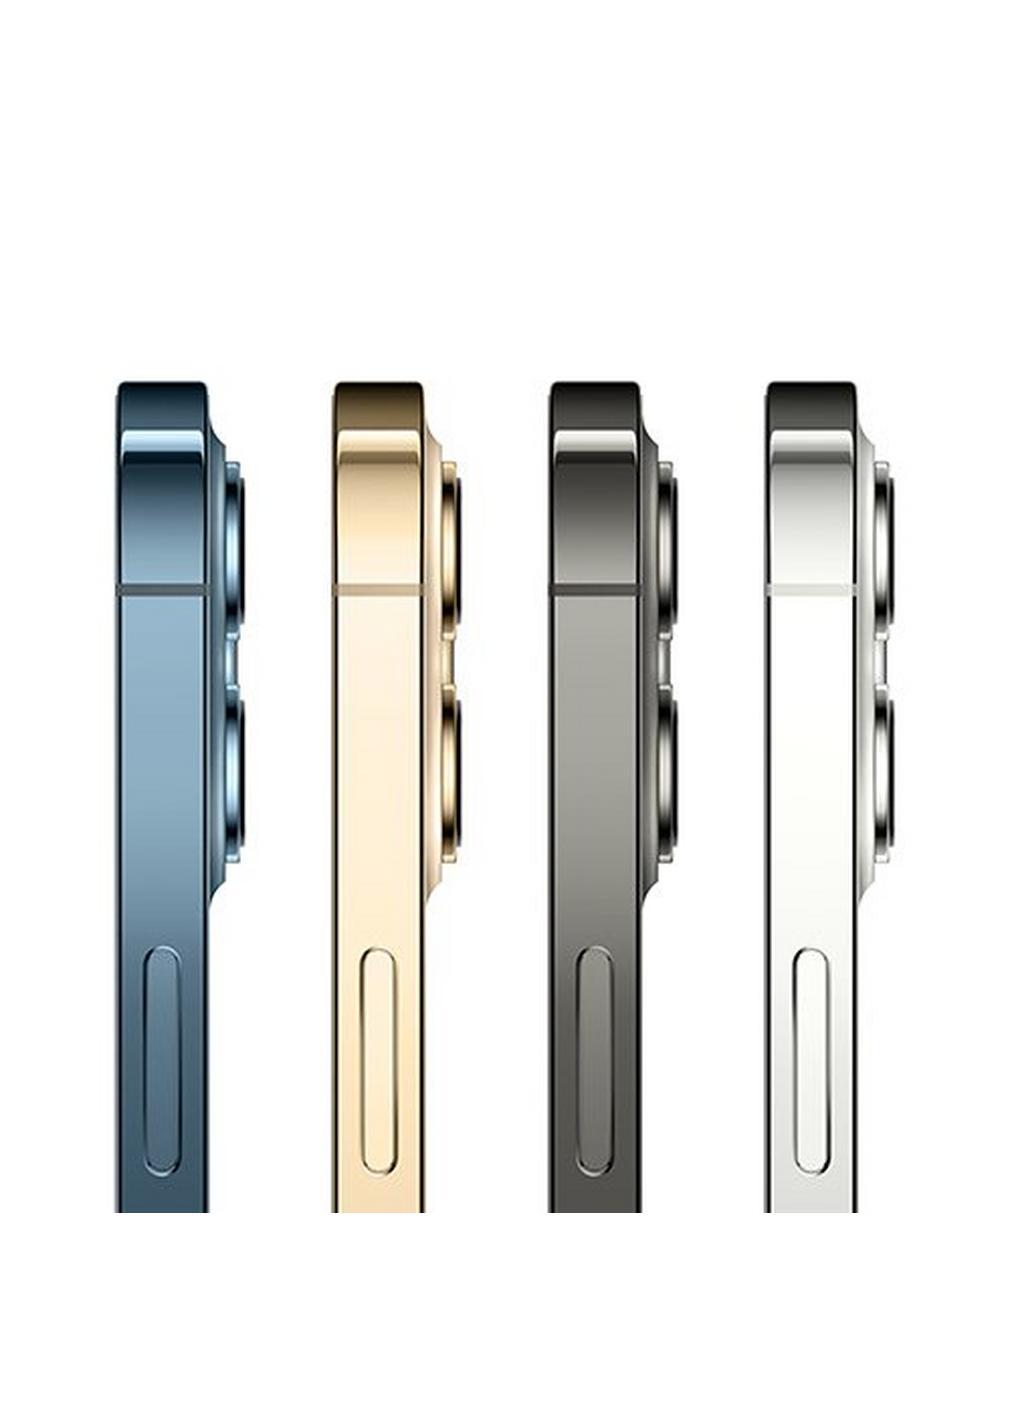 Apple iPhone 12 Pro Max, 5G, 128 GB, Pacific Blue